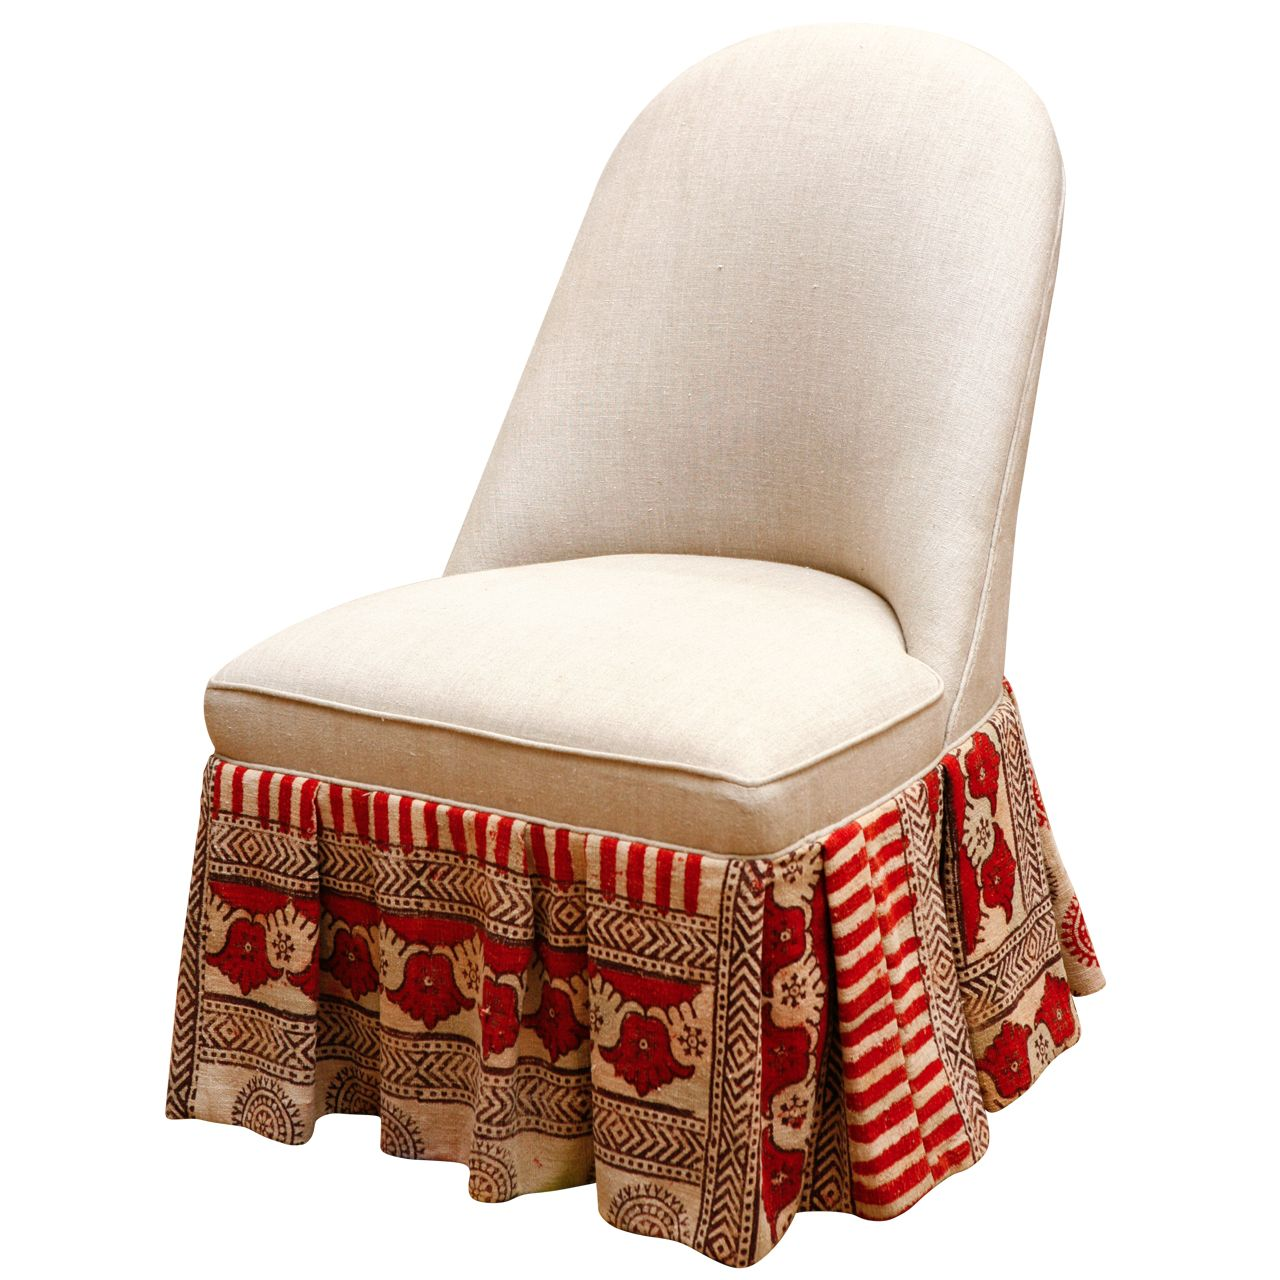 Sensational Slipper Chair With Vintage Indian Kalamkari Fabric Theyellowbook Wood Chair Design Ideas Theyellowbookinfo